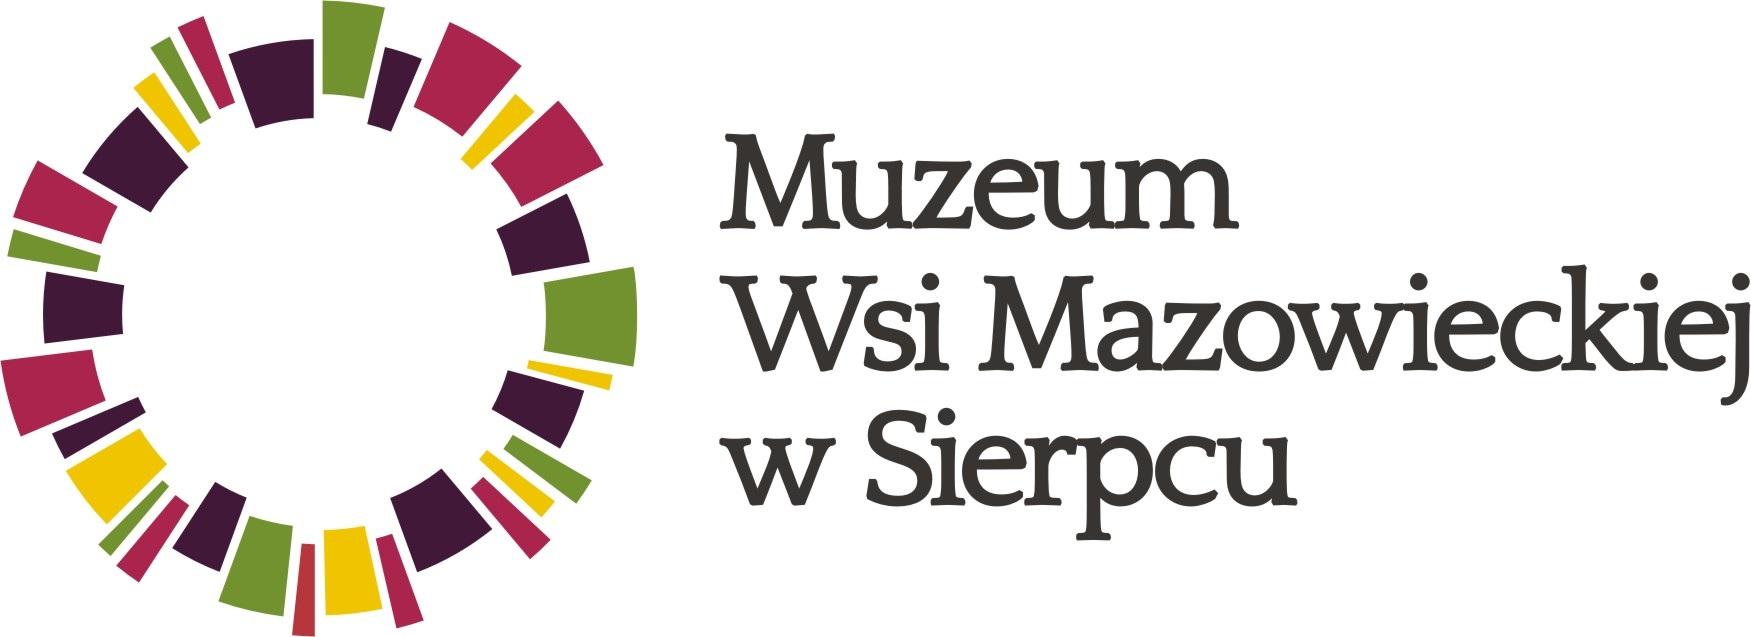 logo_koniec-lata-w-sierpeckim-skansenie